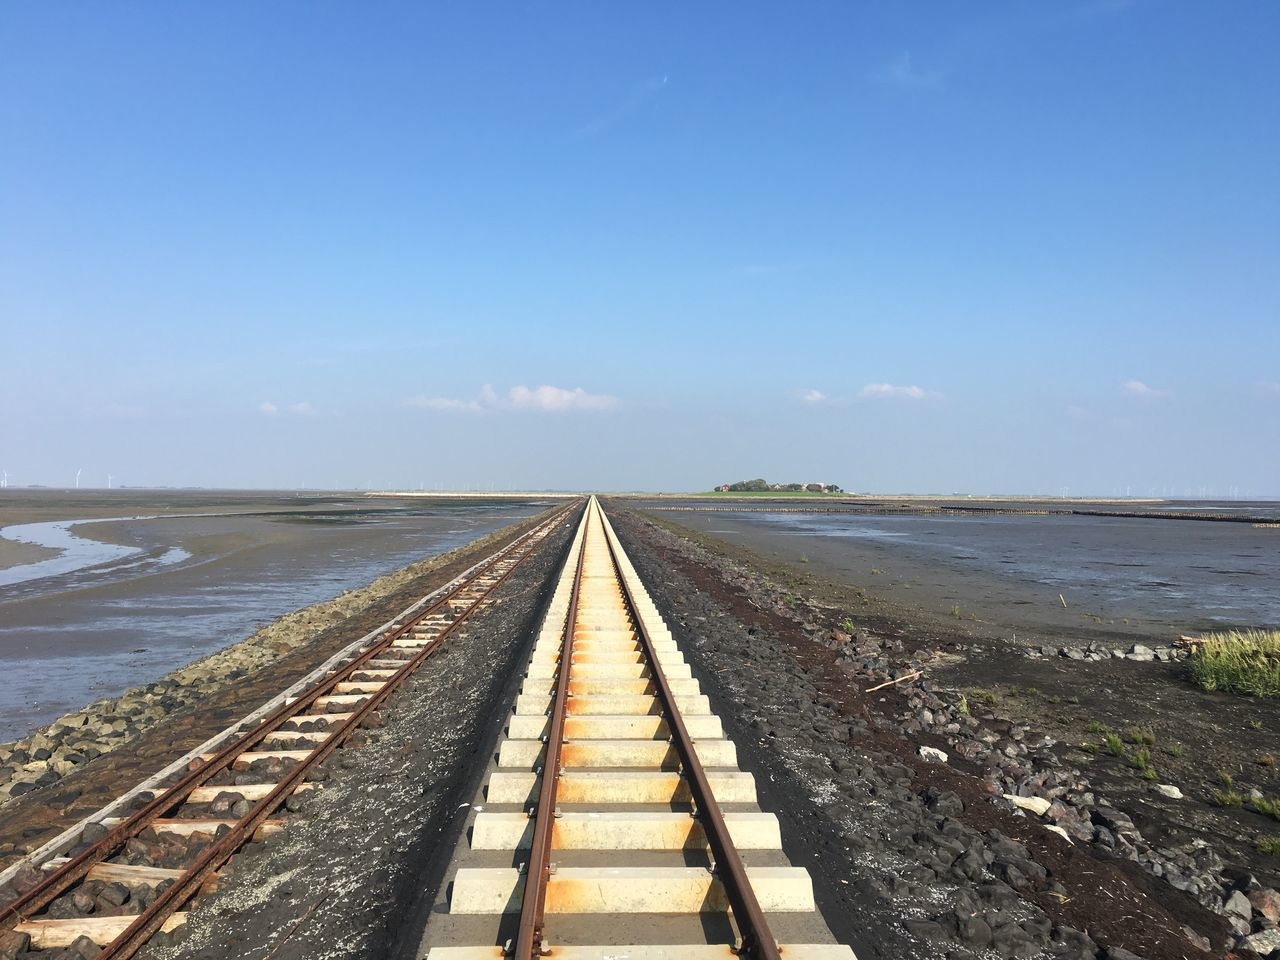 Day Ebbe Hallig Langenes Lore Lorenbahn No People Northsea Outdoors Railroad Track Railway Sea Sky Tide